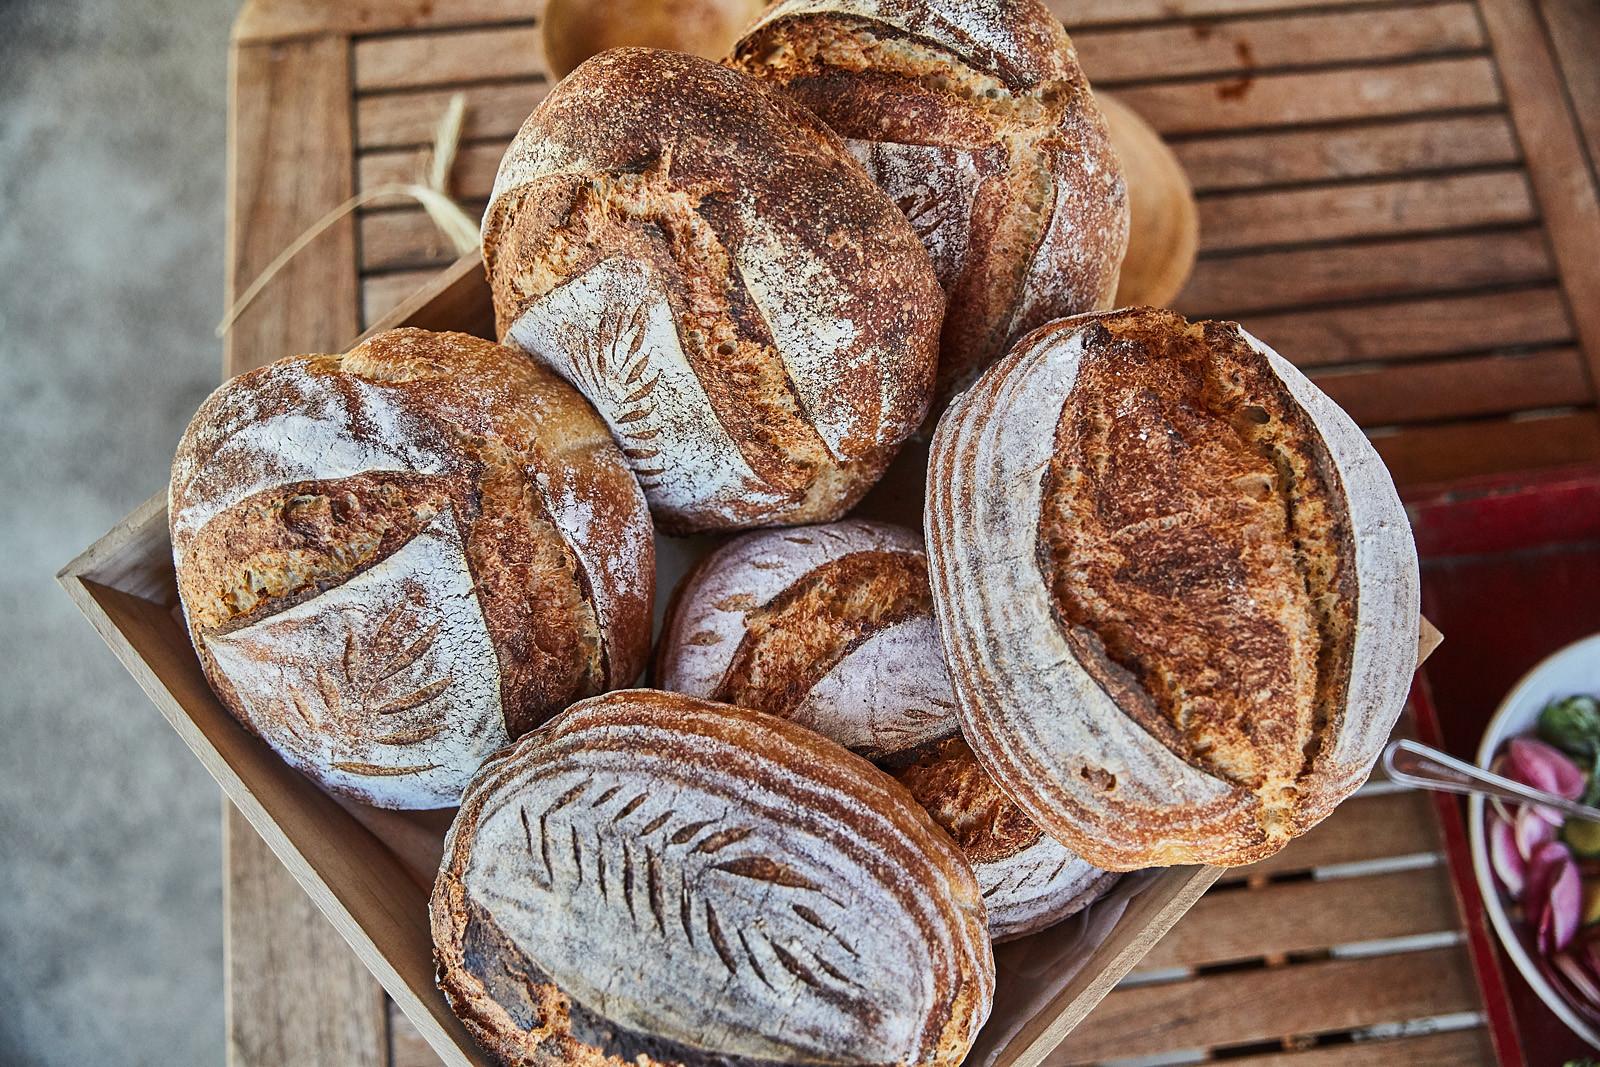 BREAD_FOOD INTERRUPTED_GRAIN_PANERA_PHOT